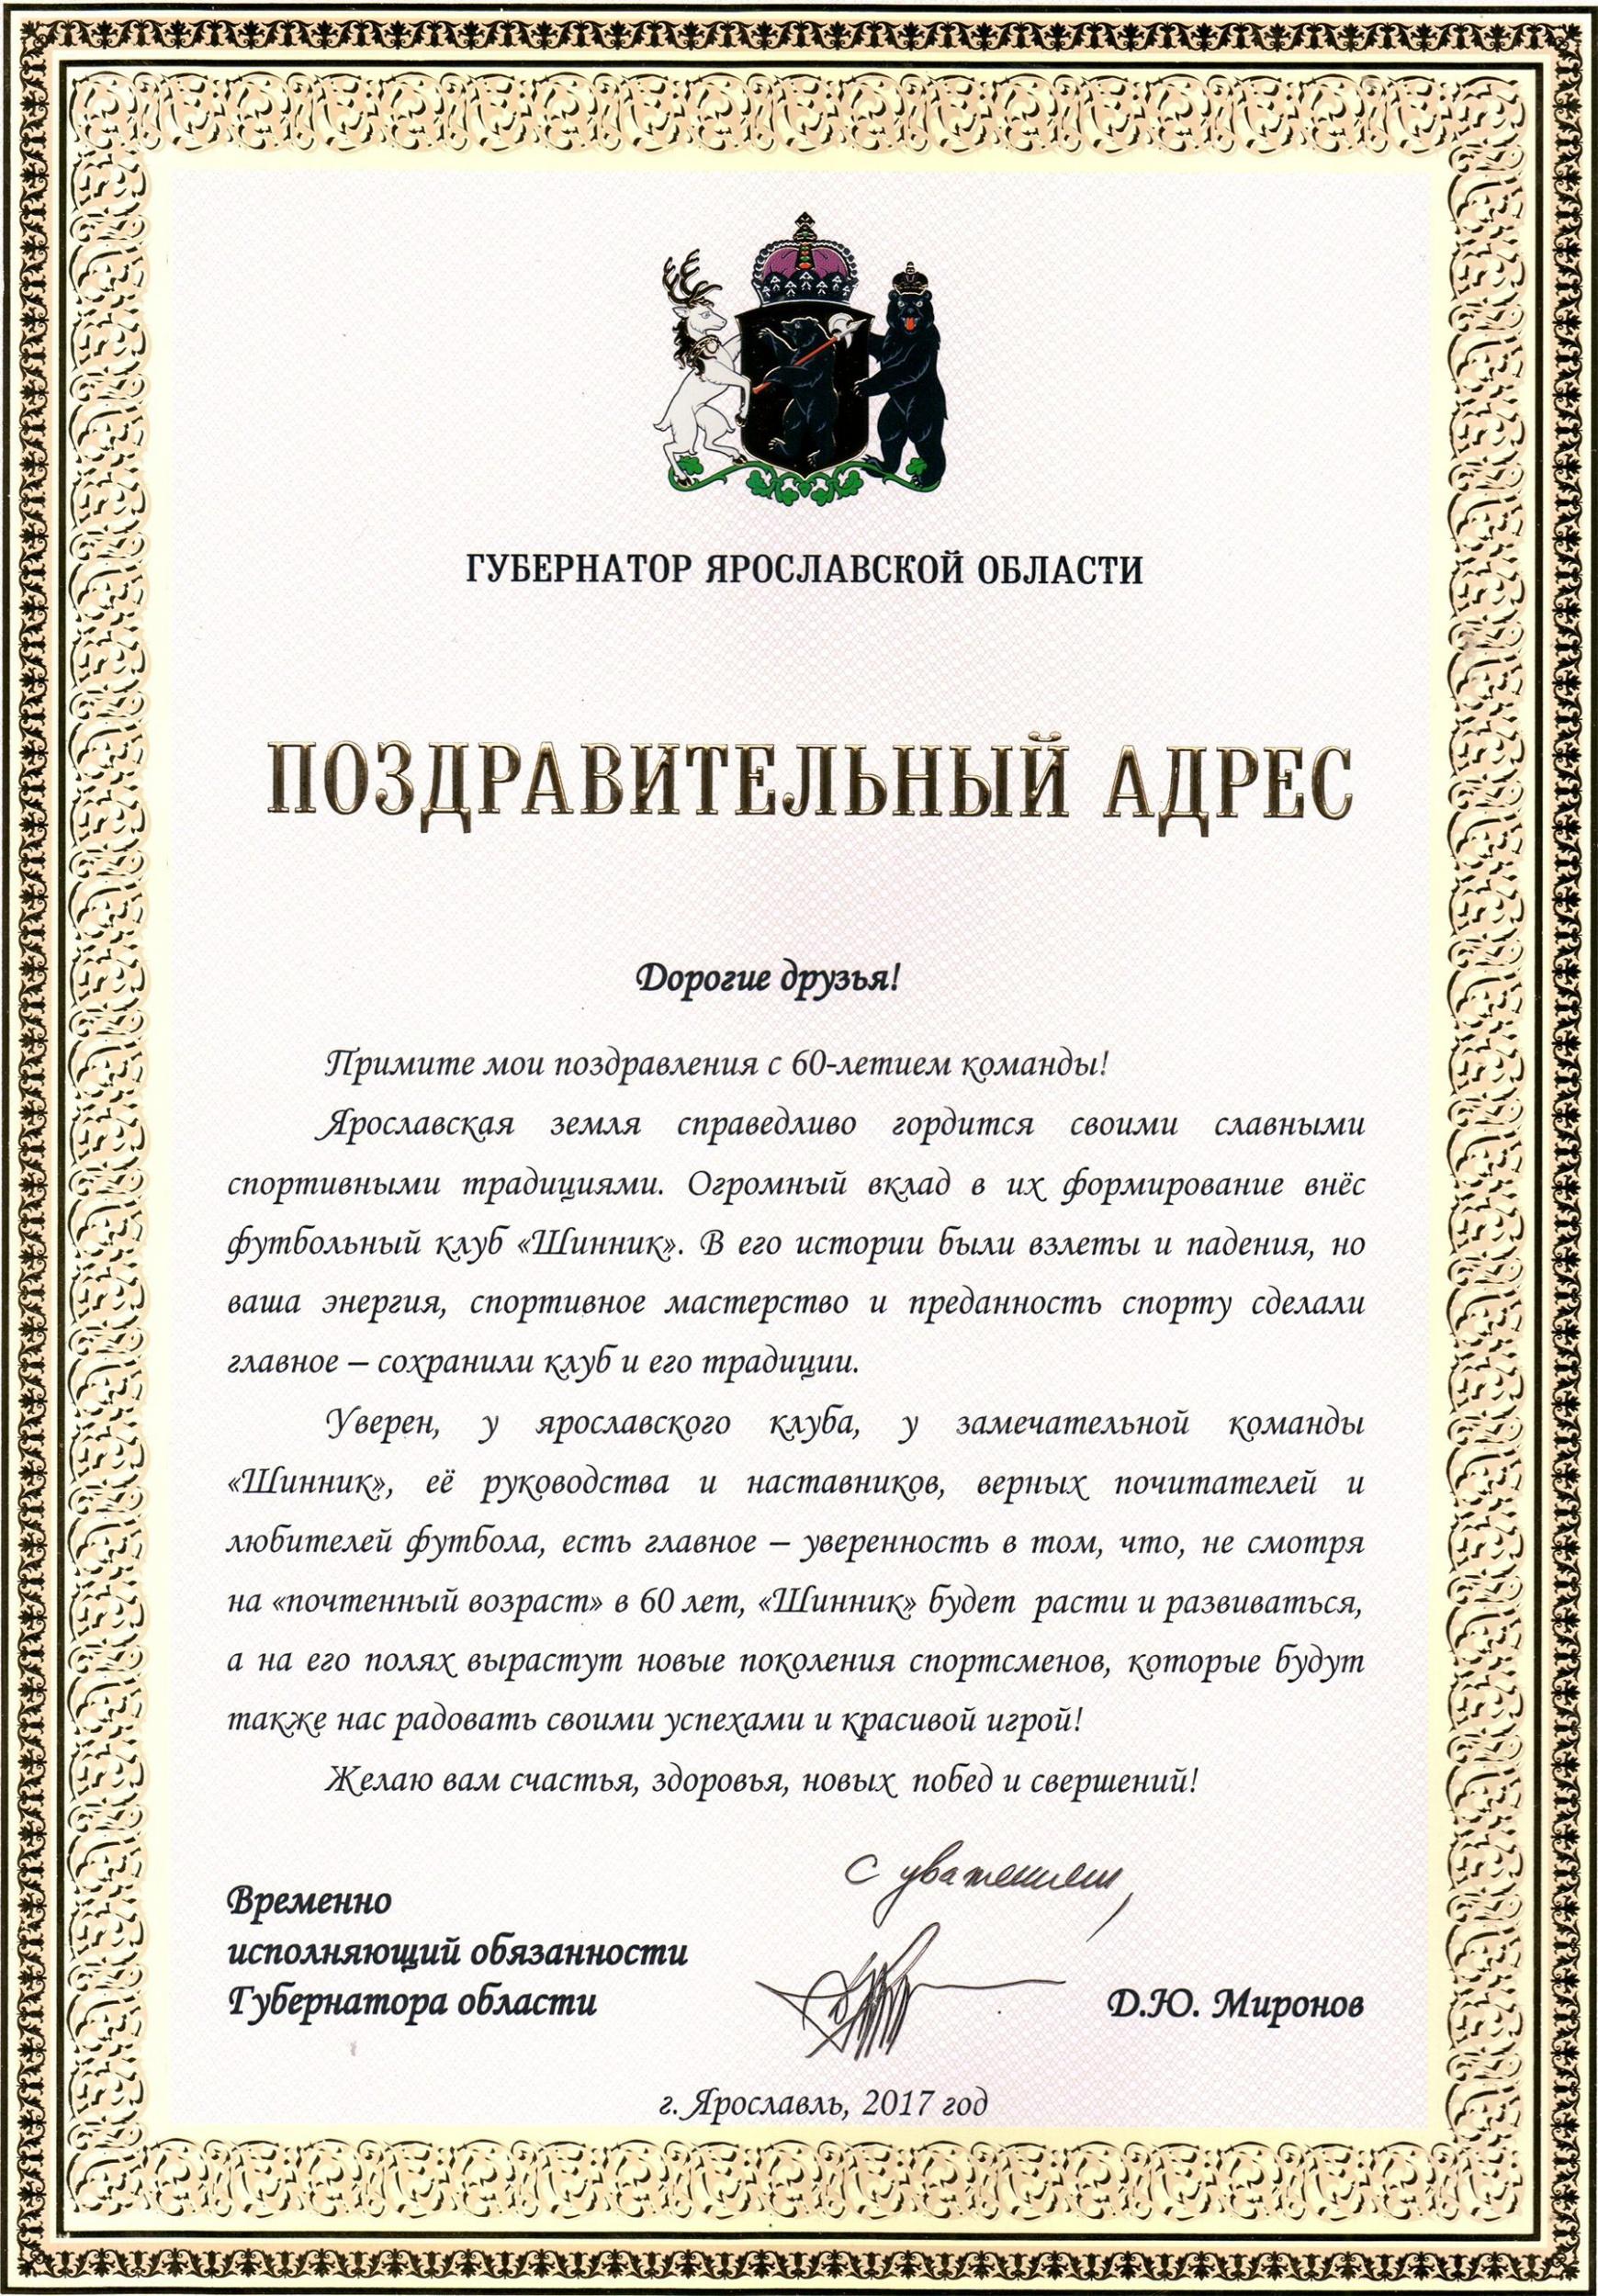 Поздравления мэра с юбилеем